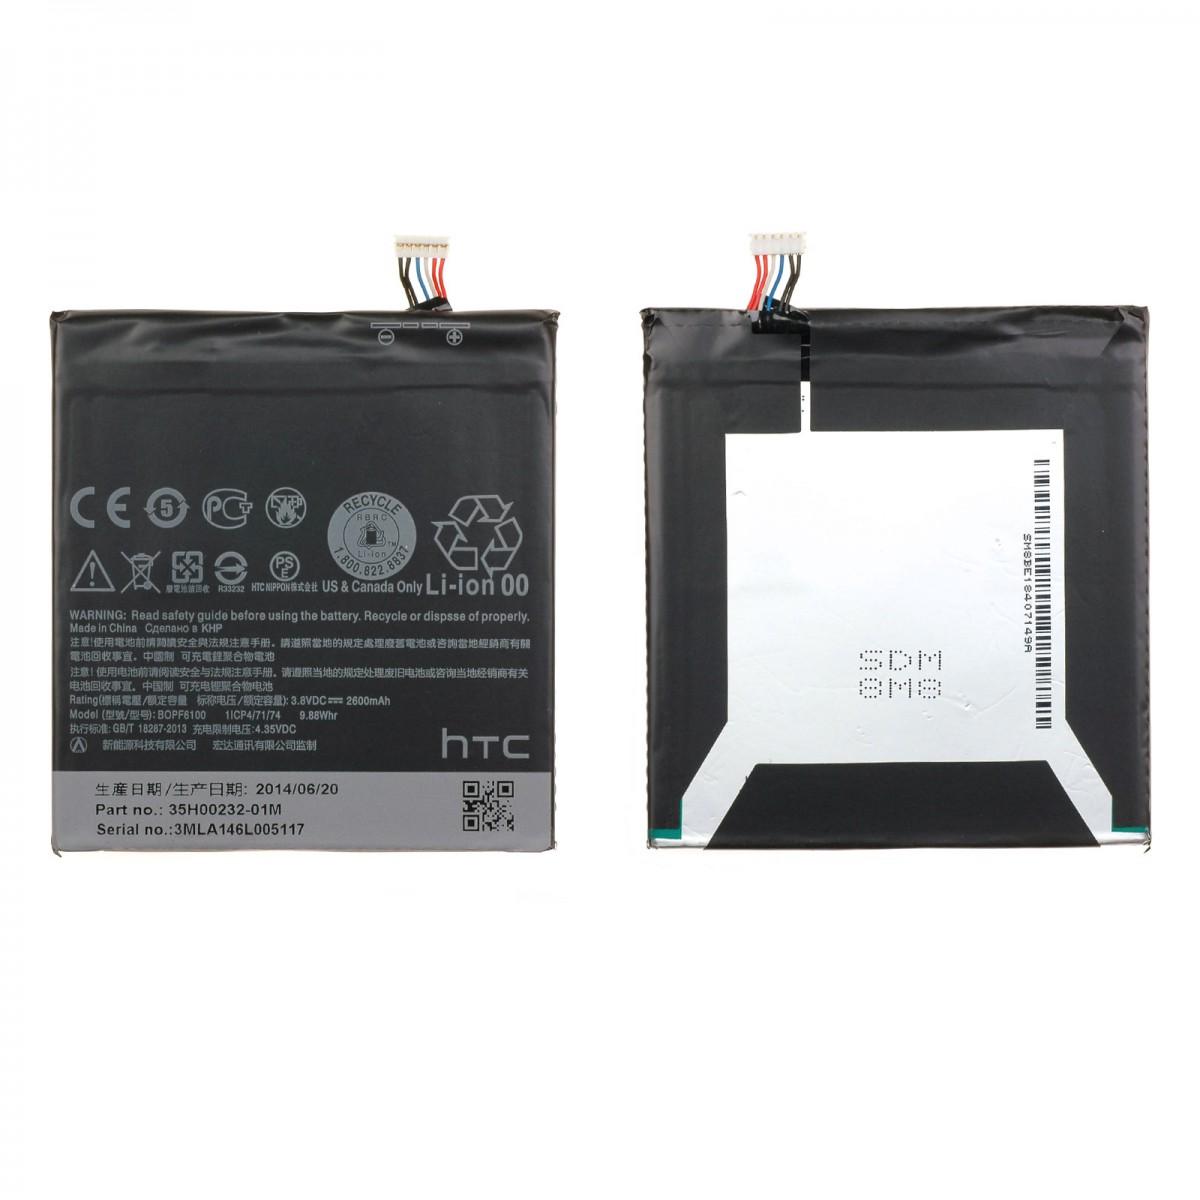 batterie bopf6100 htc desire 820 origine achat en ligne sur lcd maroc. Black Bedroom Furniture Sets. Home Design Ideas